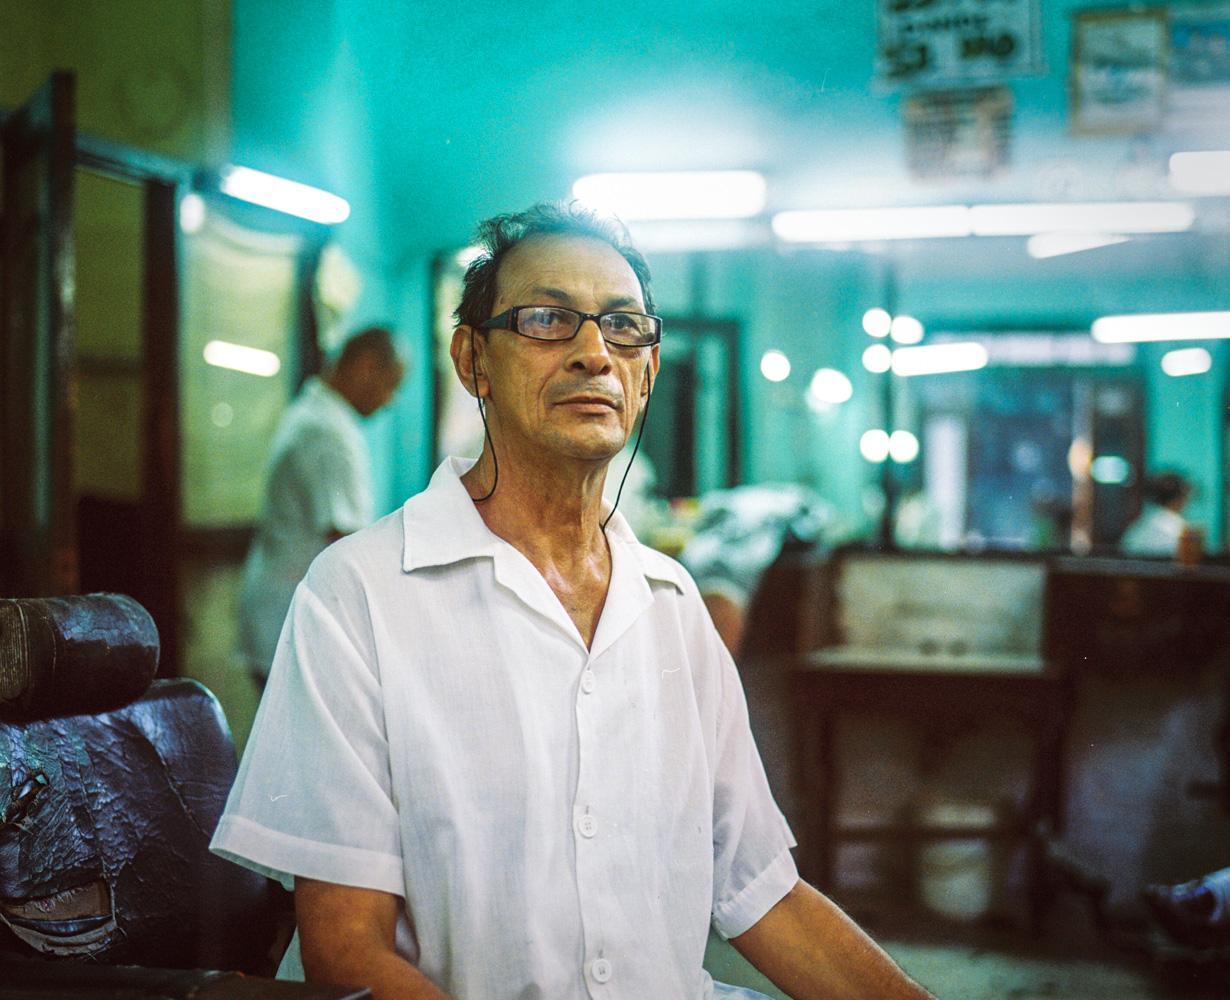 Hairdresser in Cuba.jpg